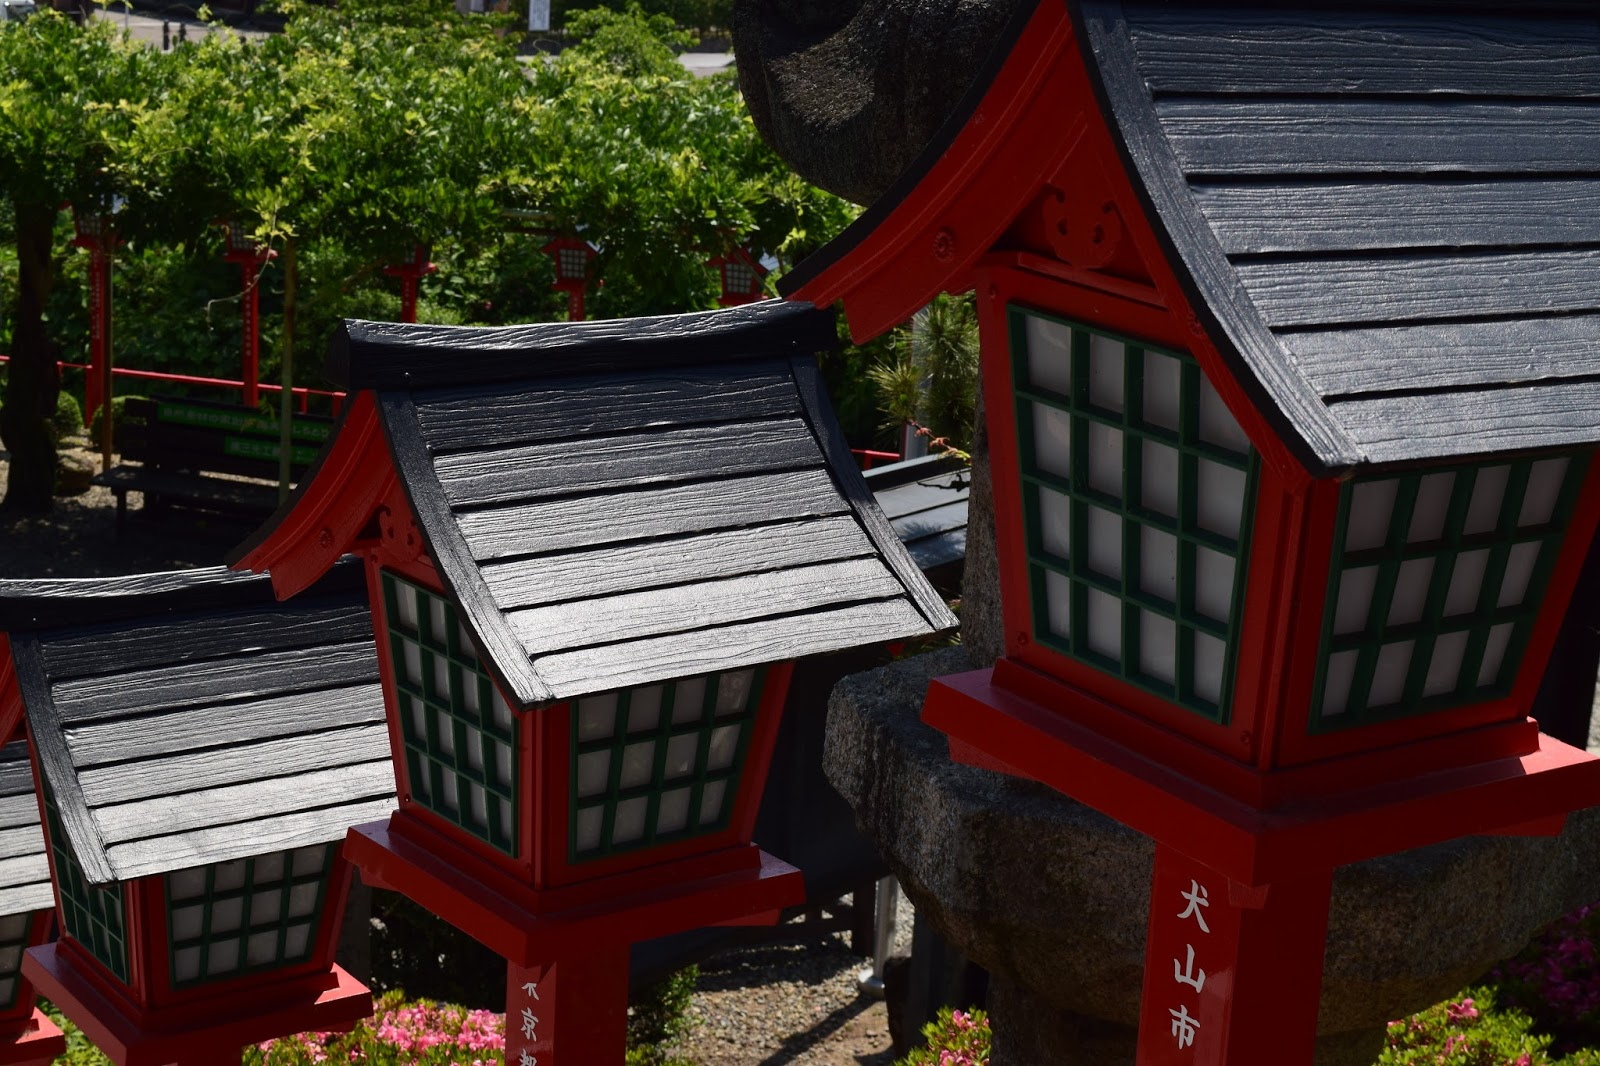 Sankou Inari Jinja